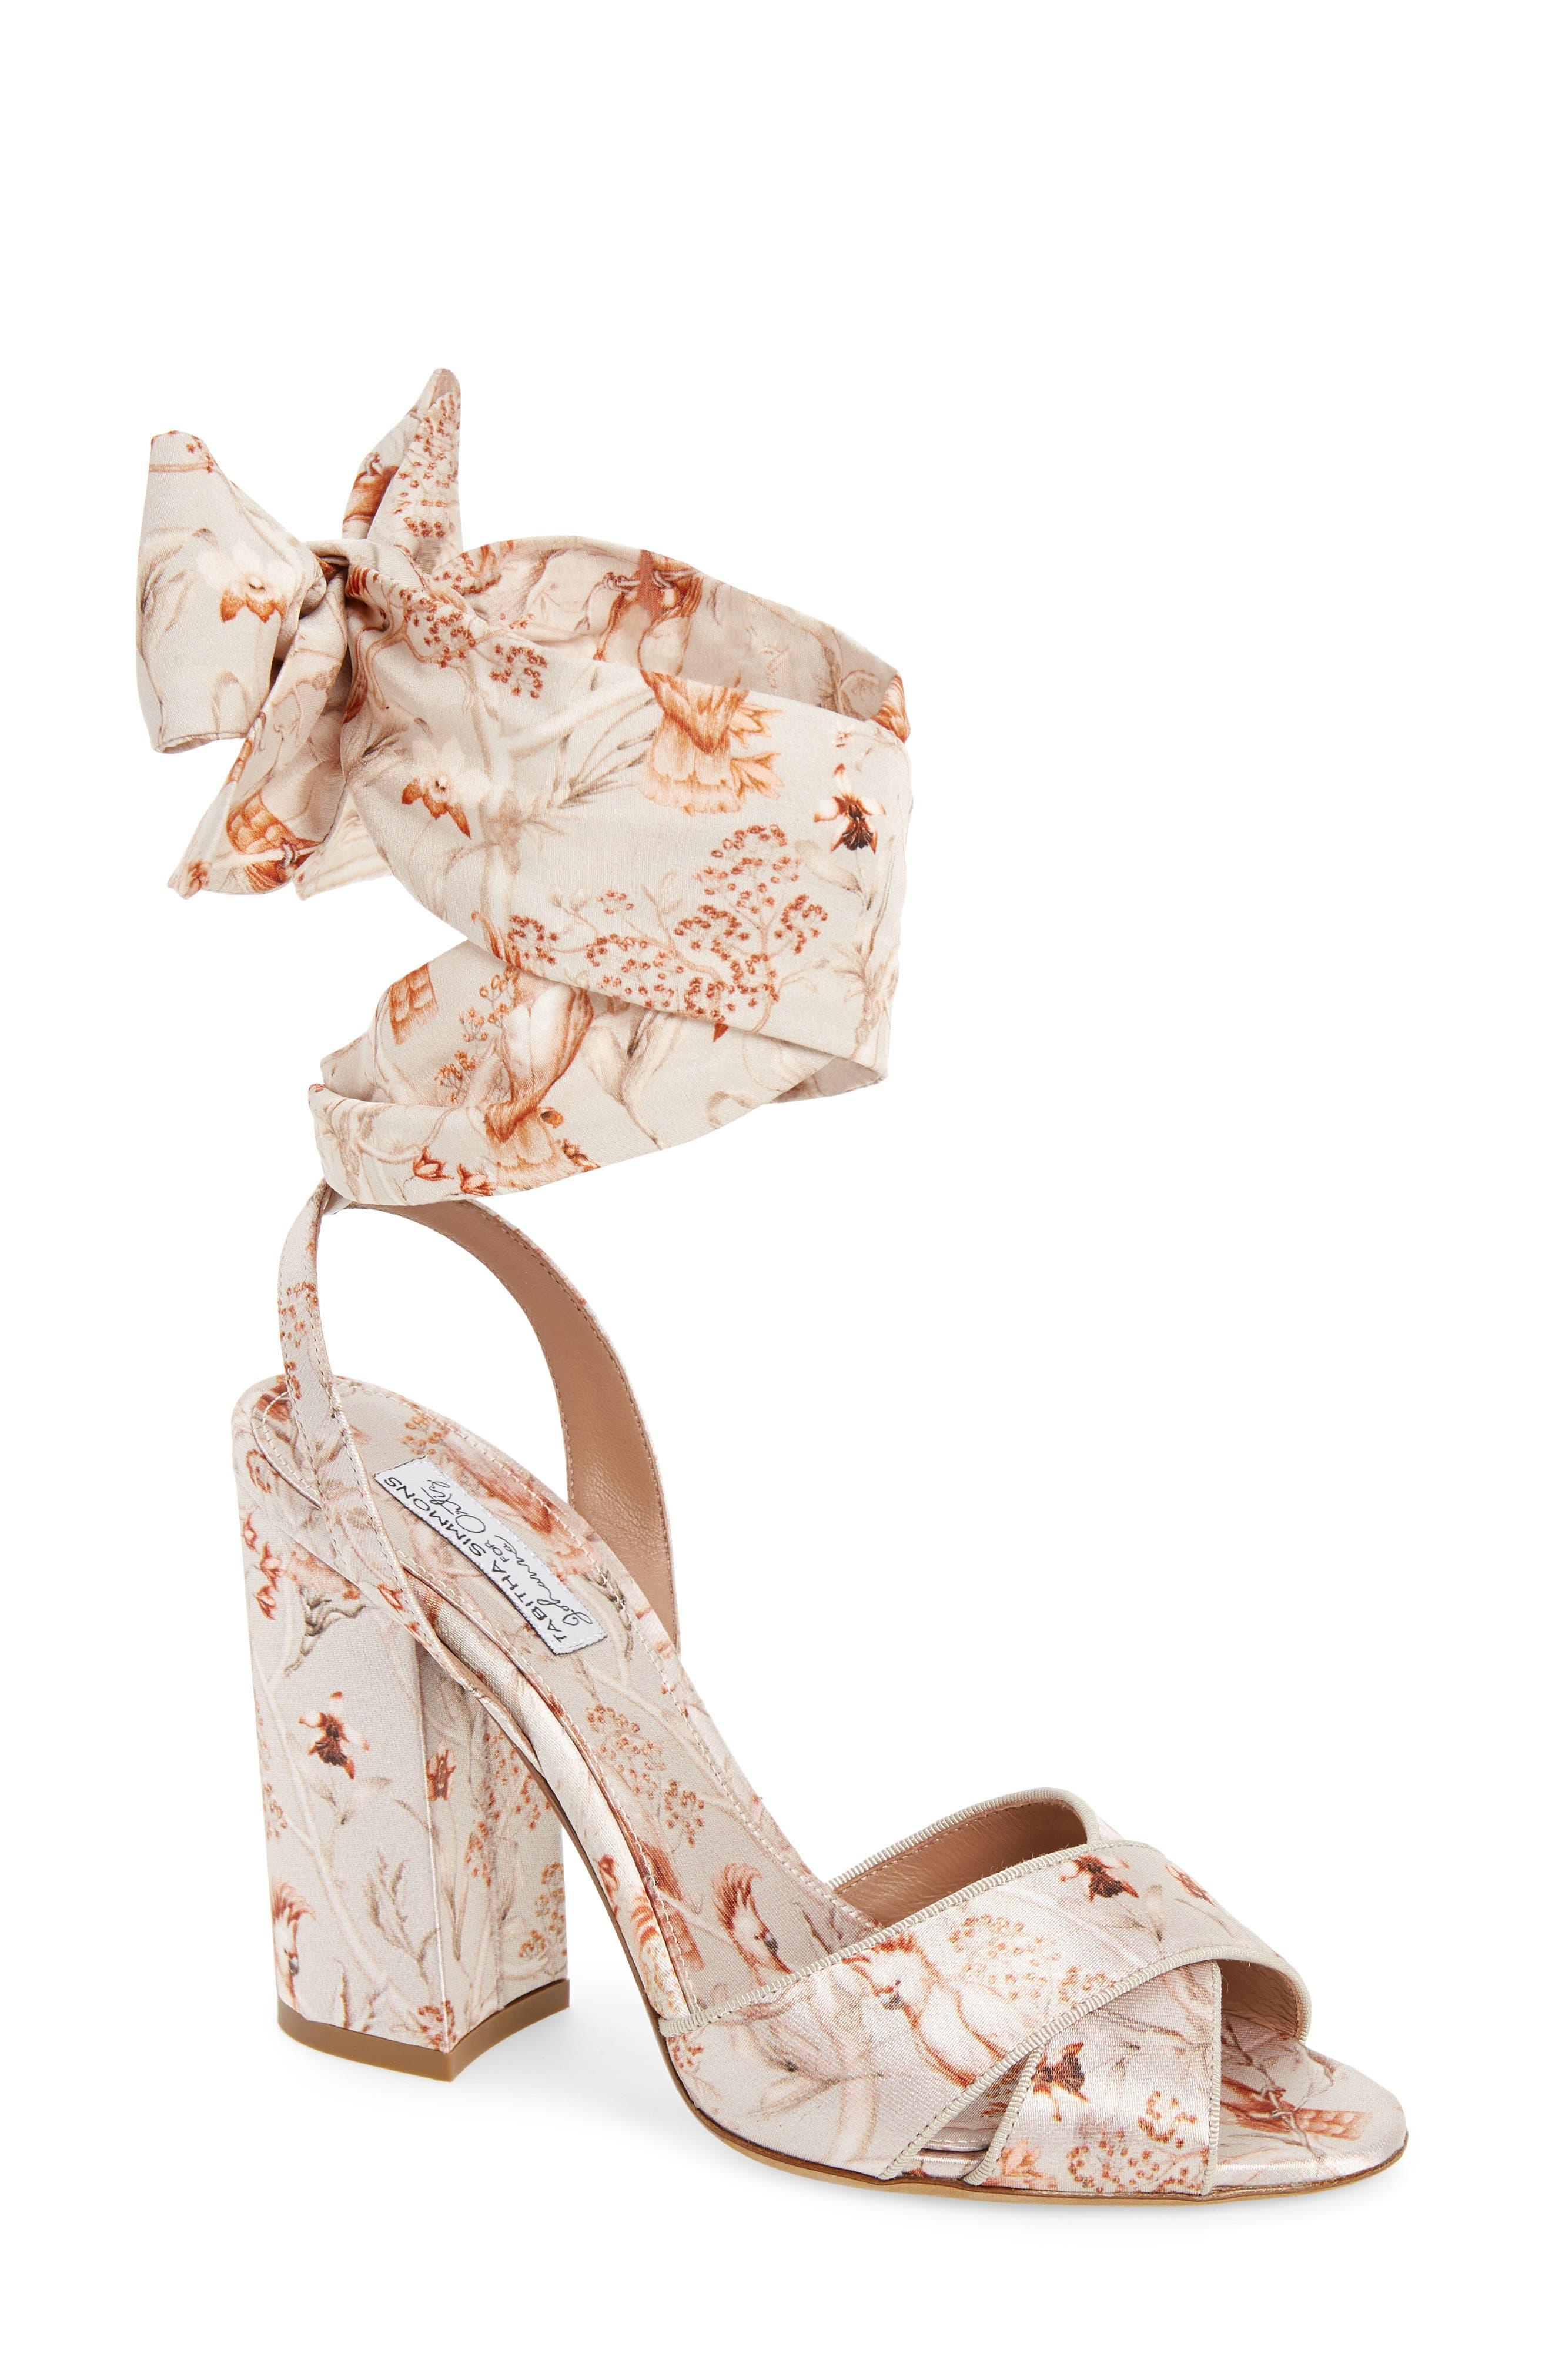 Tabitha Simmons Connie Wrap Lace-Up Sandal, Beige